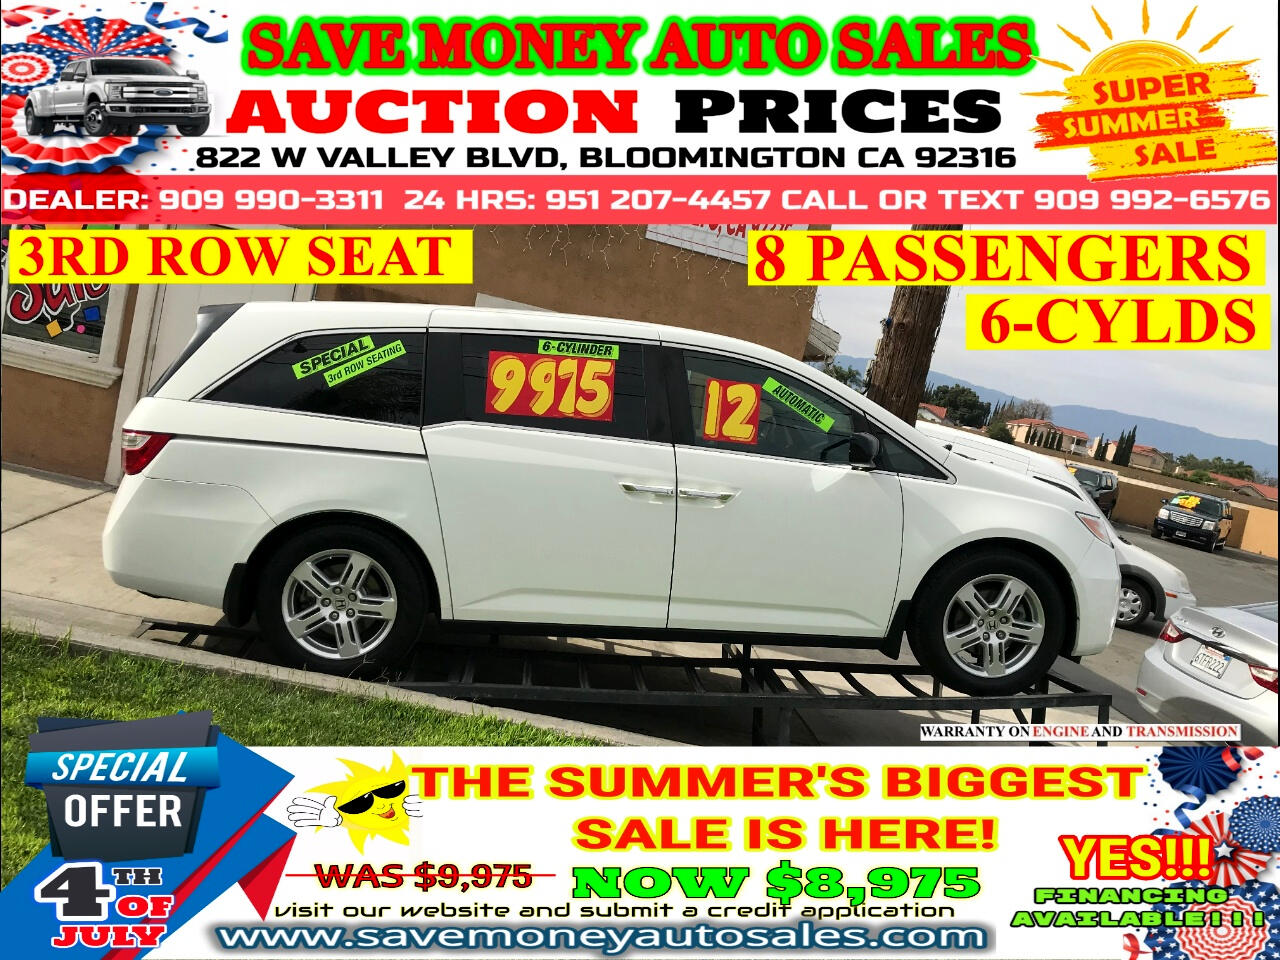 2012 Honda Odyssey 3RD ROW SEATS>8 PASSANGER>ALL LEATHER INTERIOR